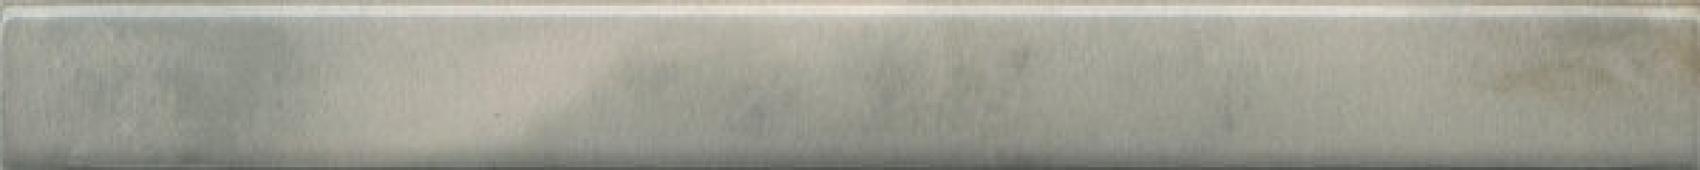 PFE021 Карандаш Стеллине серый 20*2 бордюр